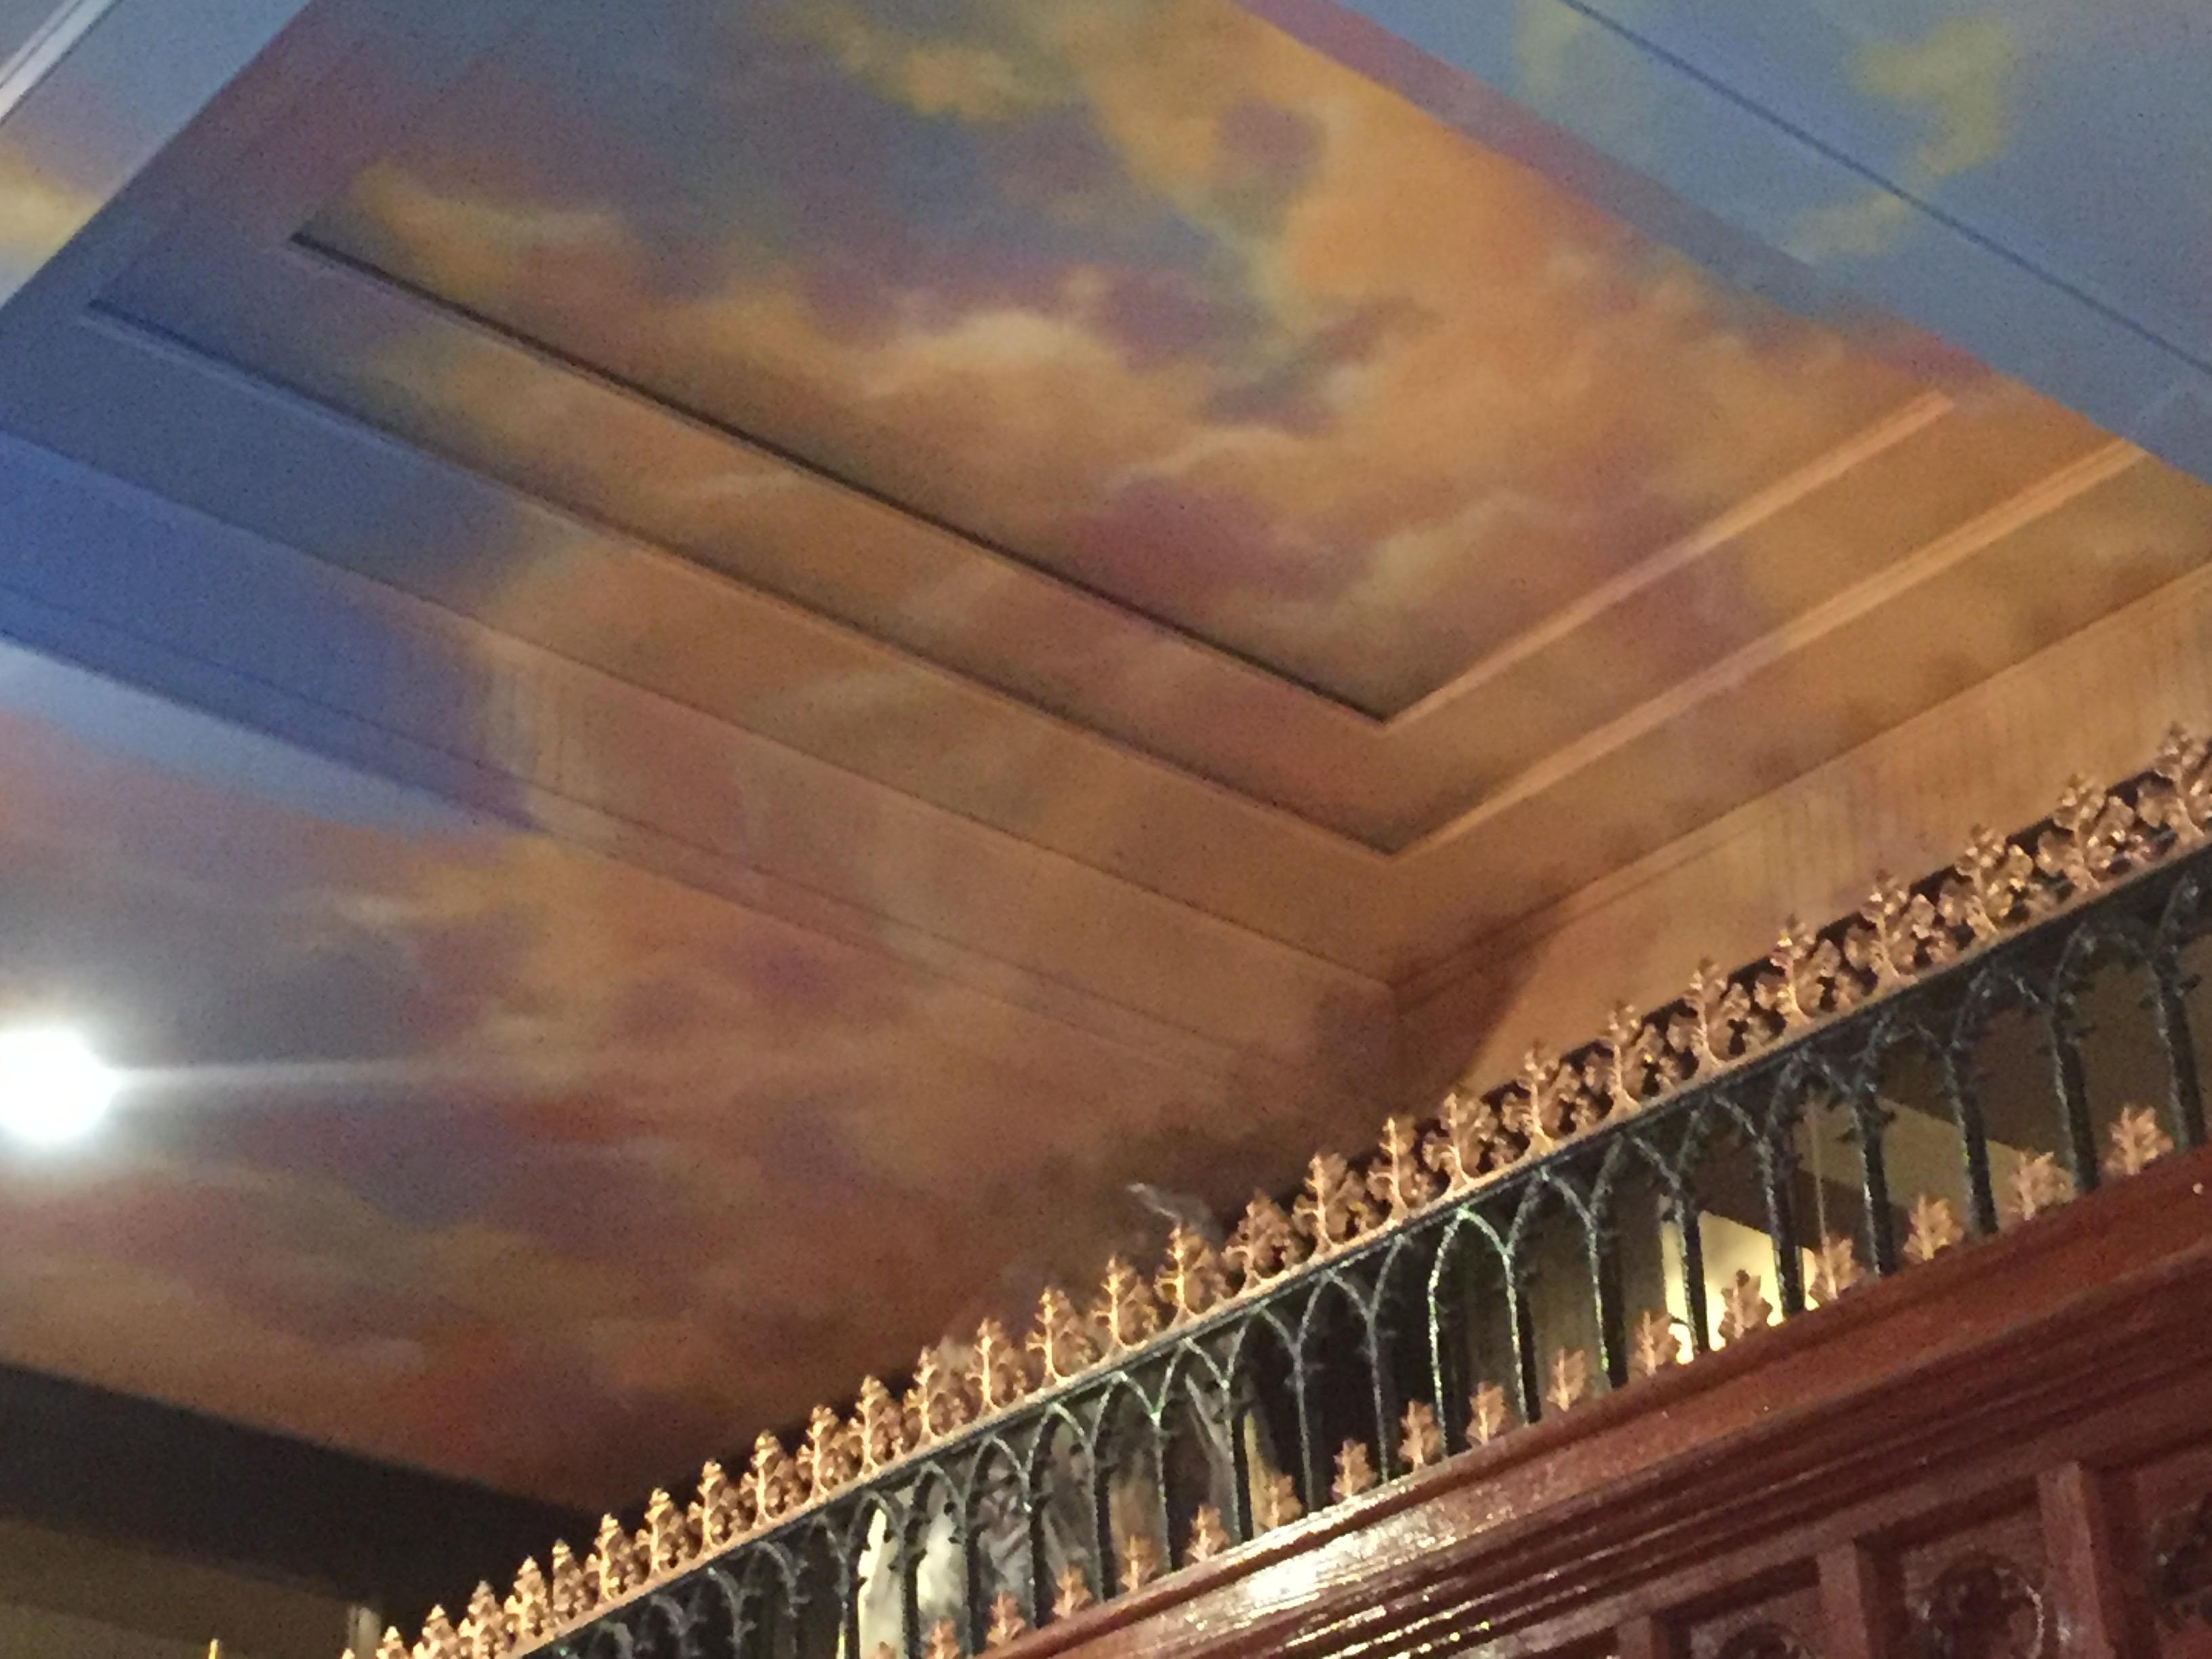 Ct Mural artist Marc Potocsky Vanity New Haven